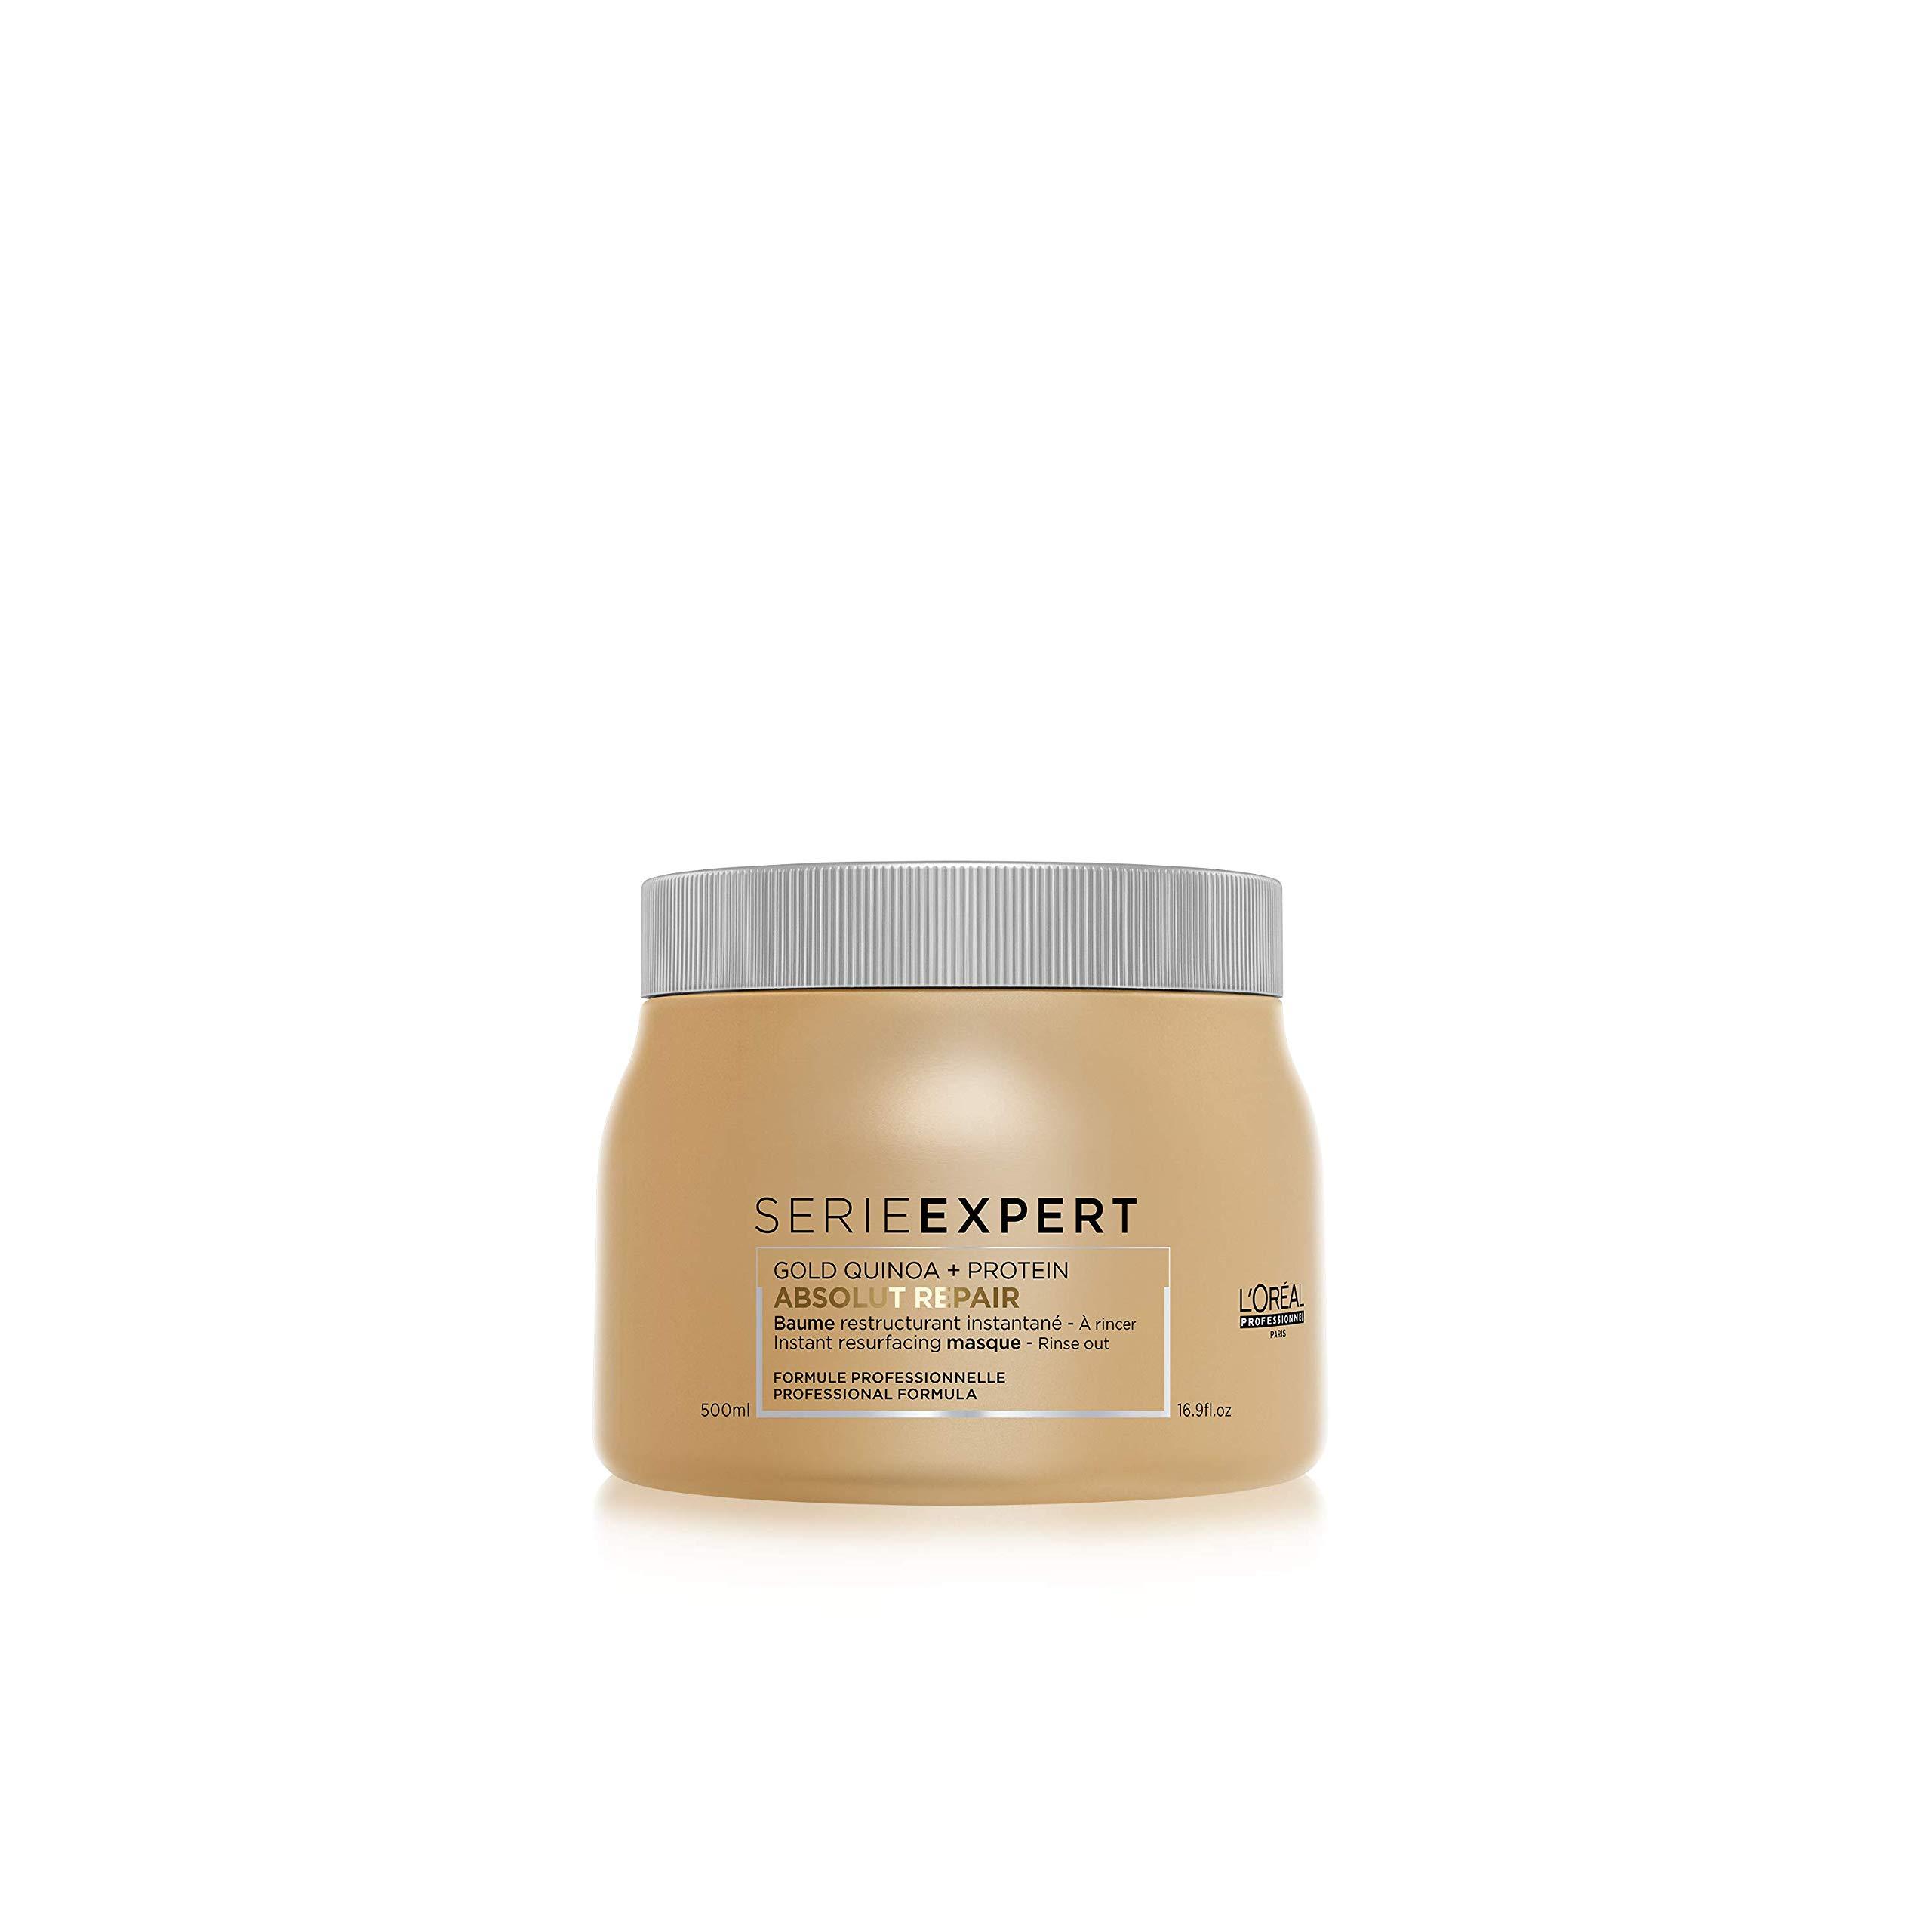 L'Oréal Professionnel | Serie Expert | Absolut Repair Hair Mask For Damaged Hair 500 ml